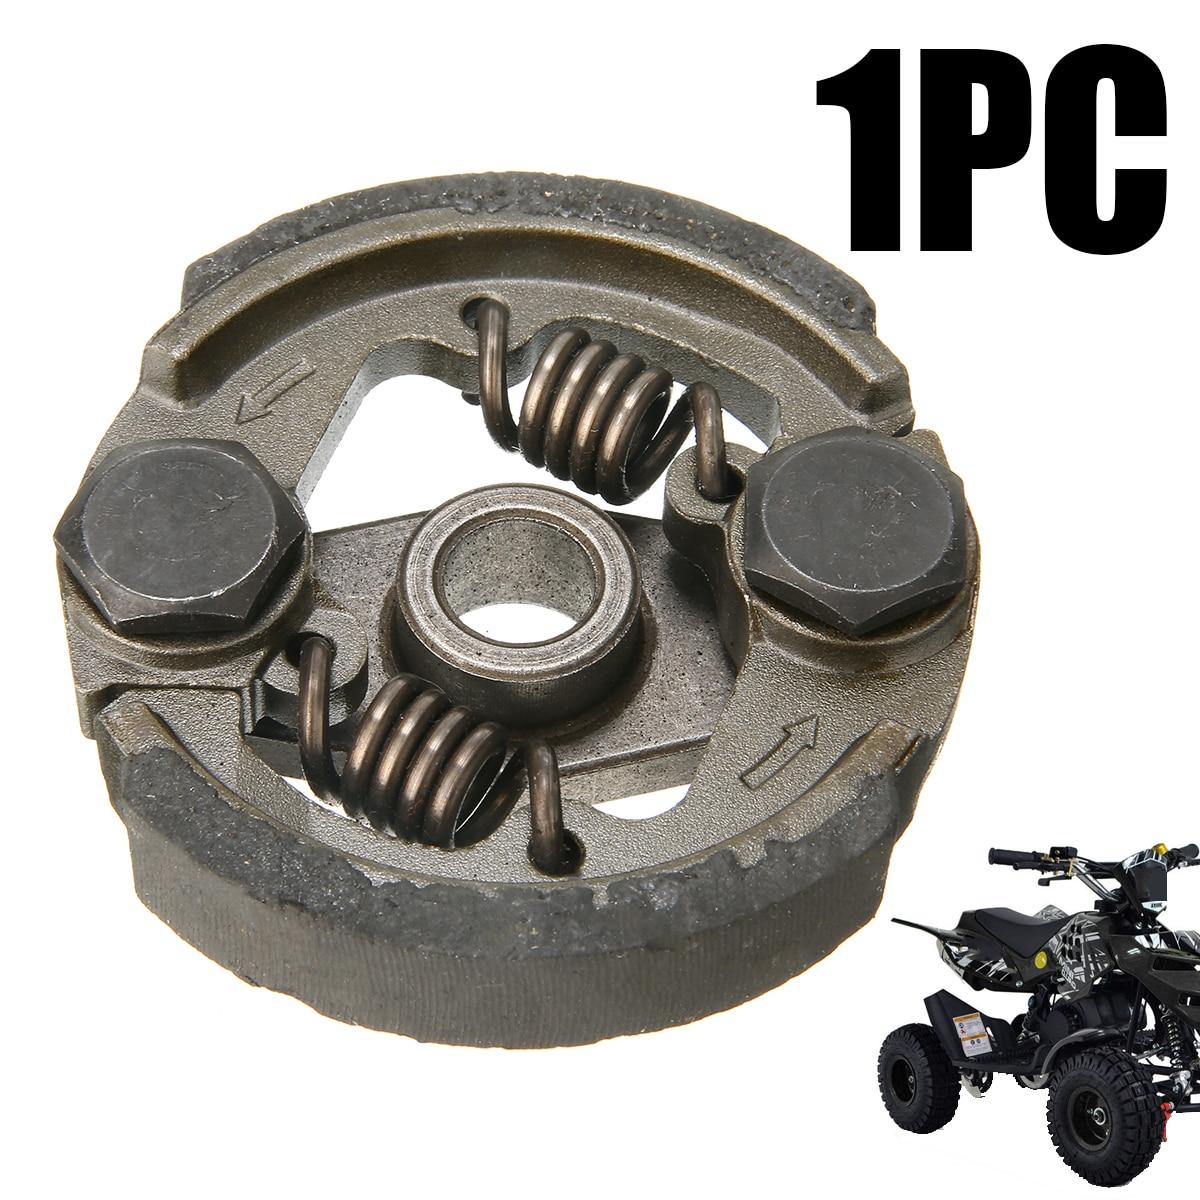 Mayitr 1PC 49cc Mini Moto Clutch Dirtbike Quad ATV Racing Bike Parts 2 Shoe 2 Spring Fits Cranks With OR Without Key Ways